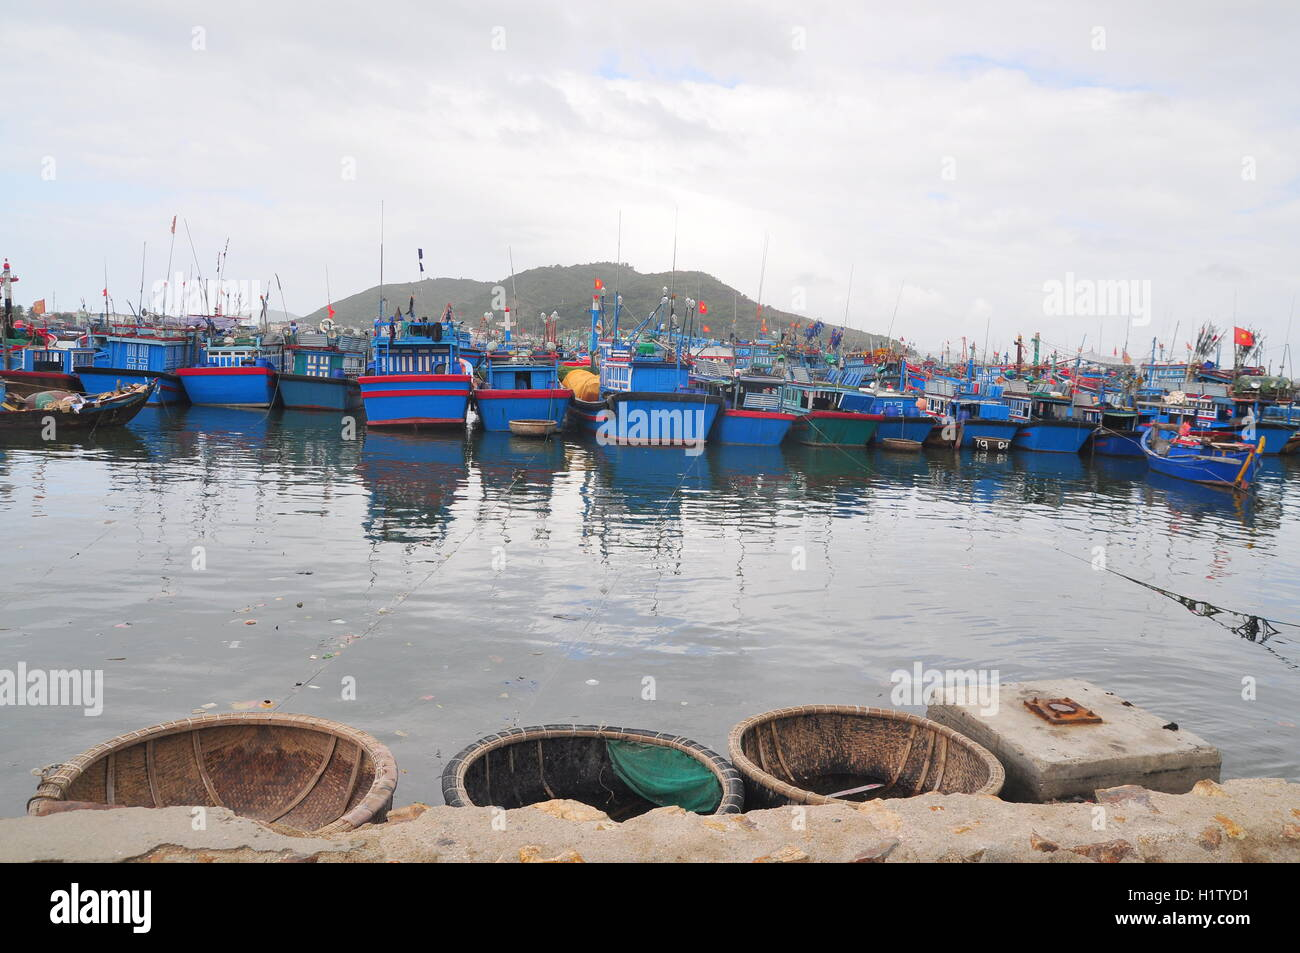 Nha Trang, Vietnam – February 21, 2013: Many fishing boat are parking at the Hon Ro seaport in Nha Trang city Stock Photo